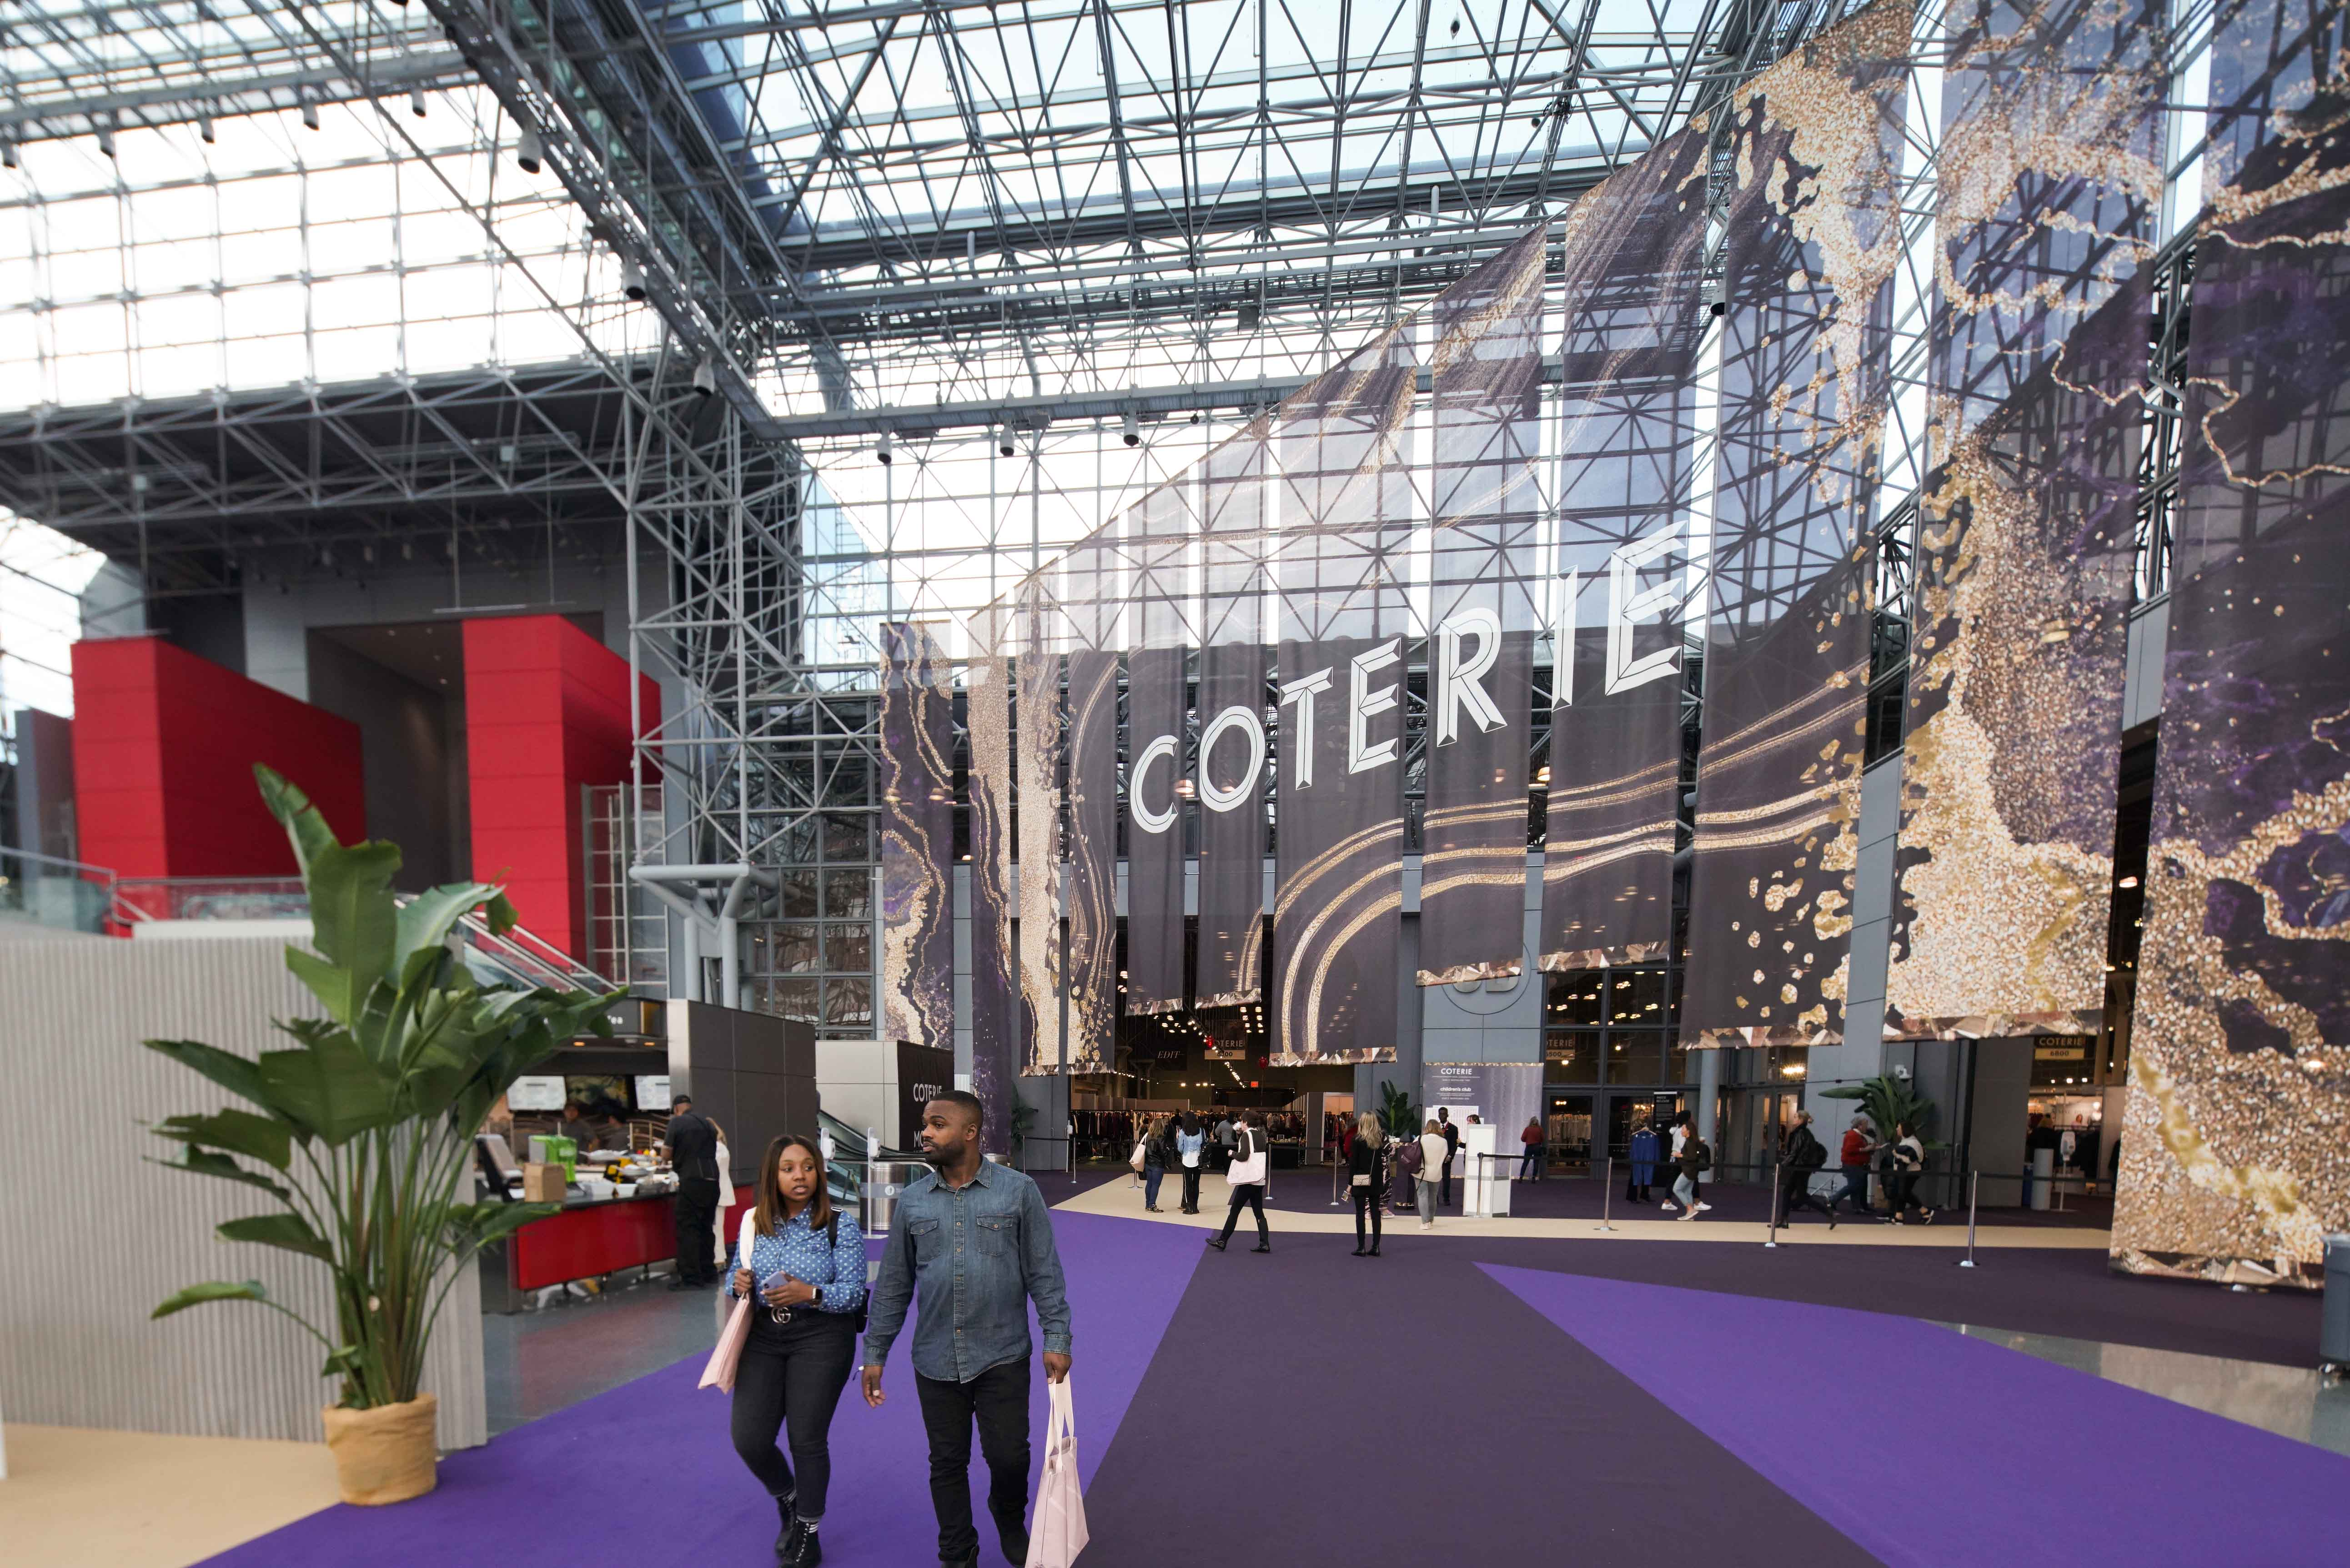 Coterie ran Feb. 11 through Feb. 13 at the Javits Center.